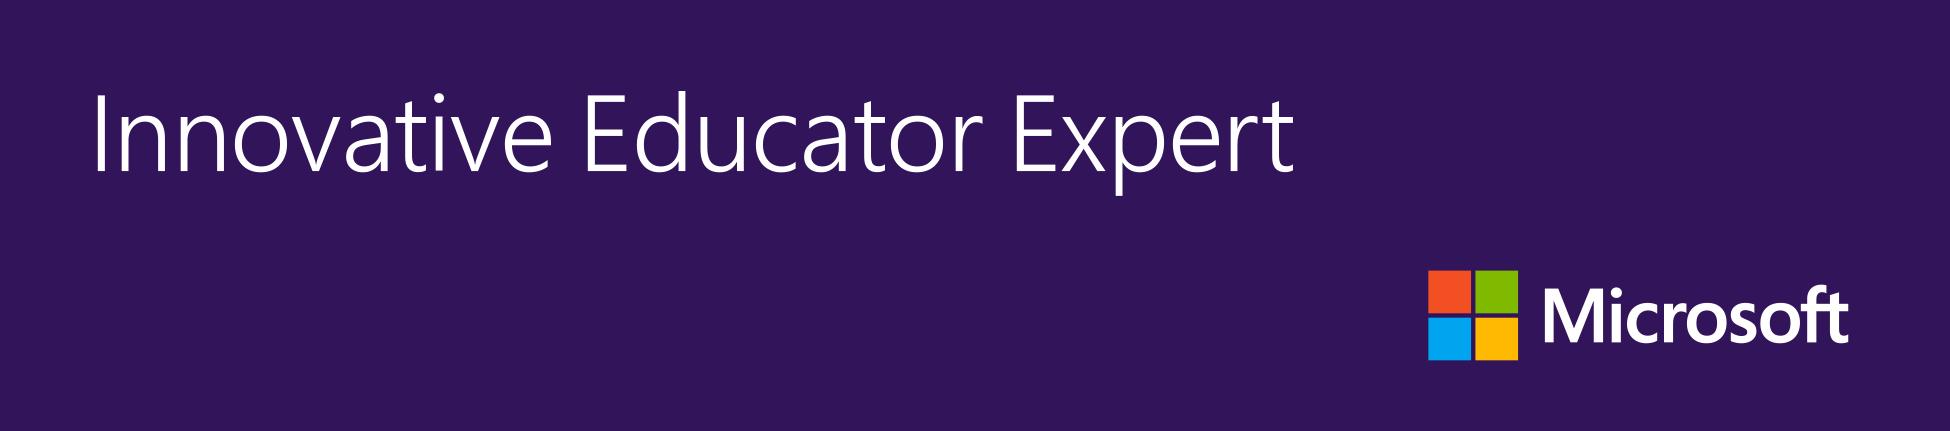 Microsoft Innovative Expert Educator